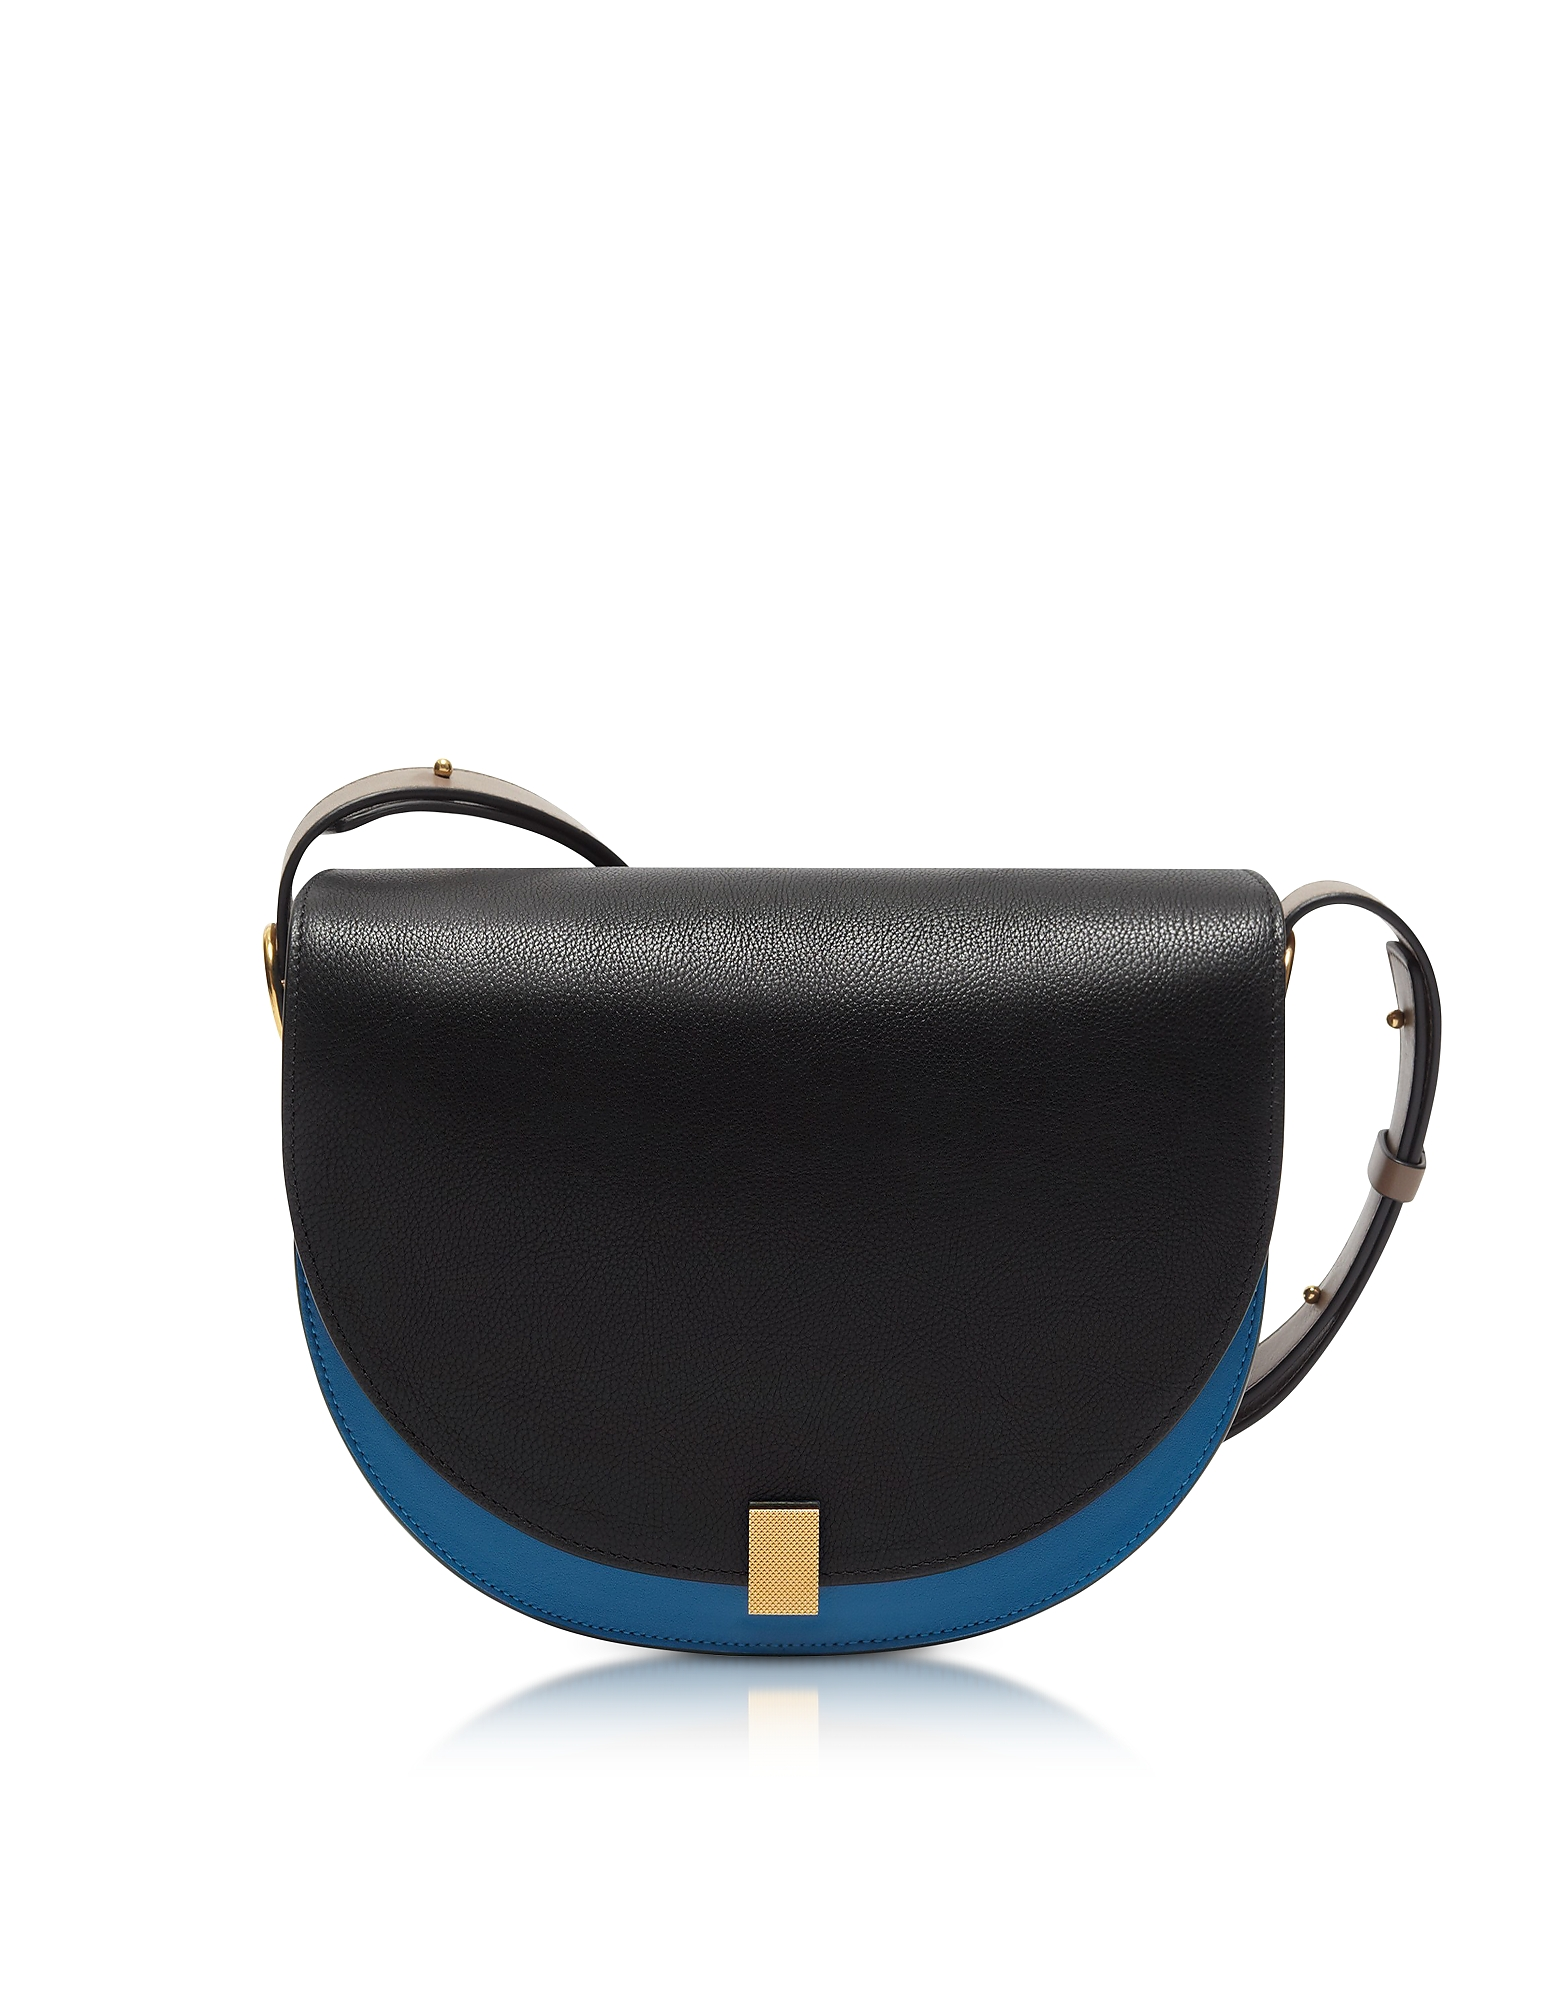 Victoria Beckham Handbags, Multimaterial Half Moon Box Shoulder Bag